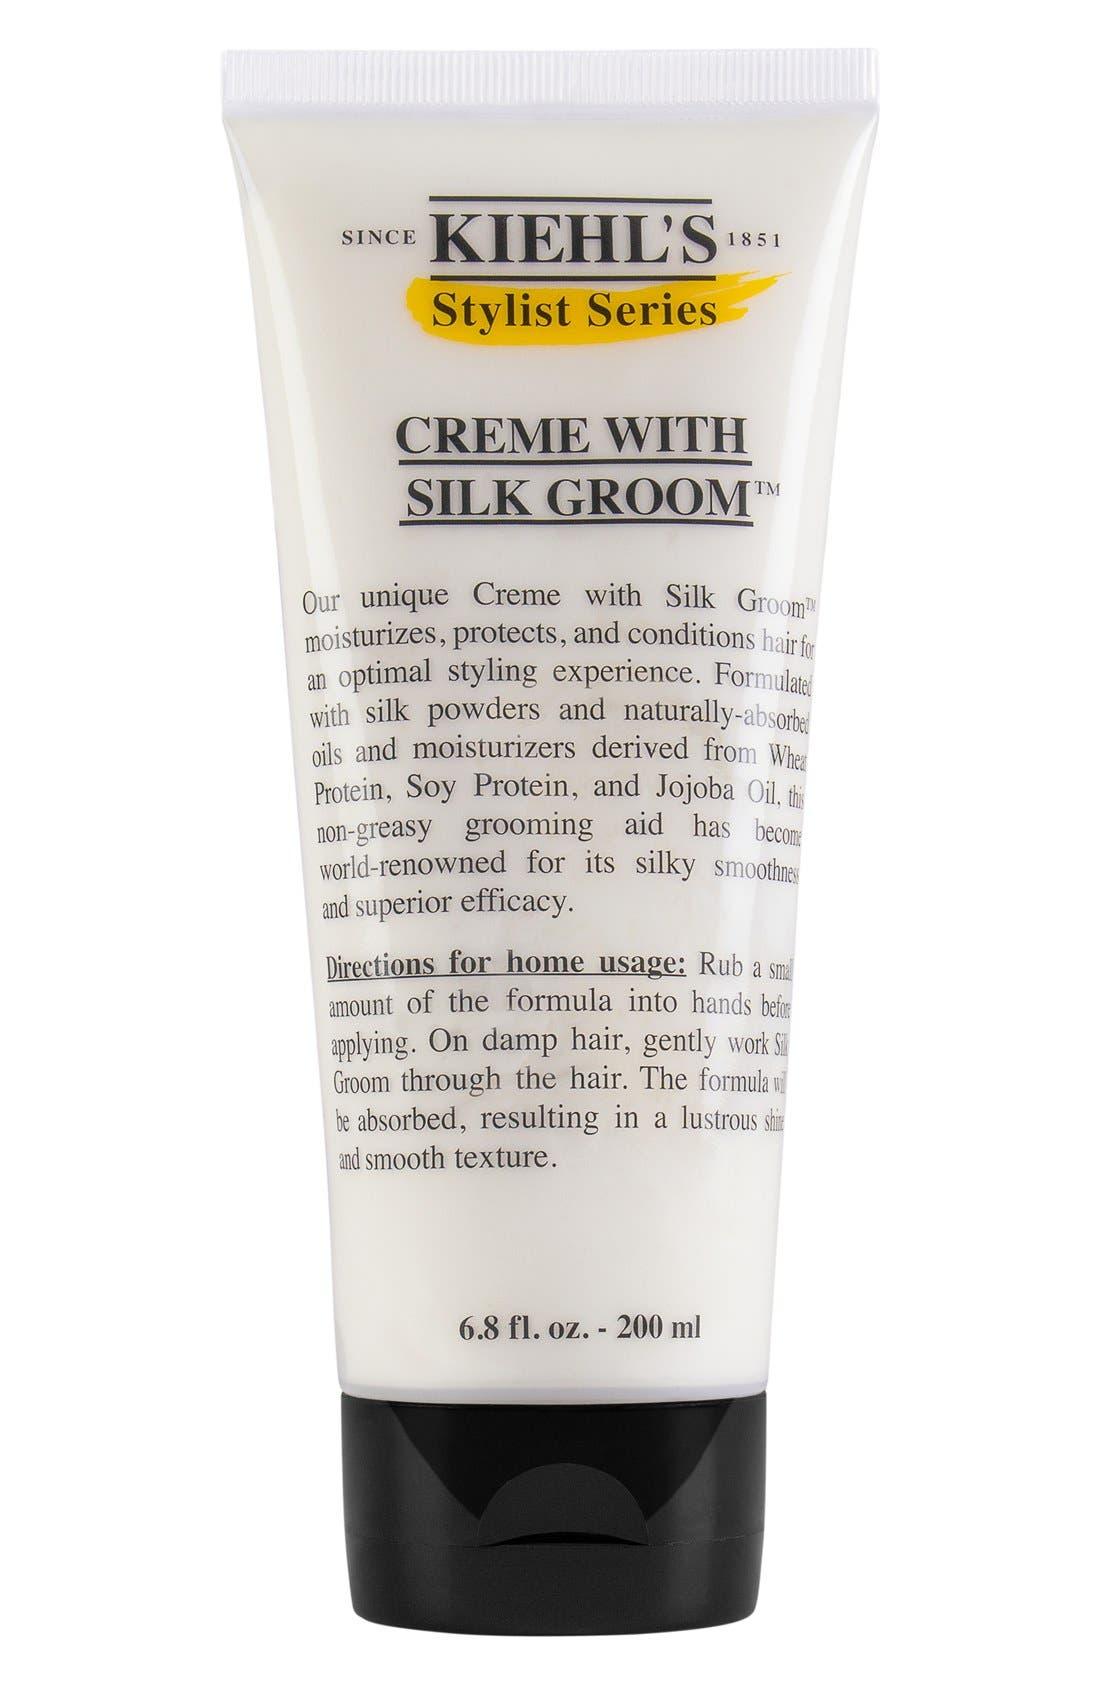 Kiehl's Since 1851 Crème with Silk Groom™